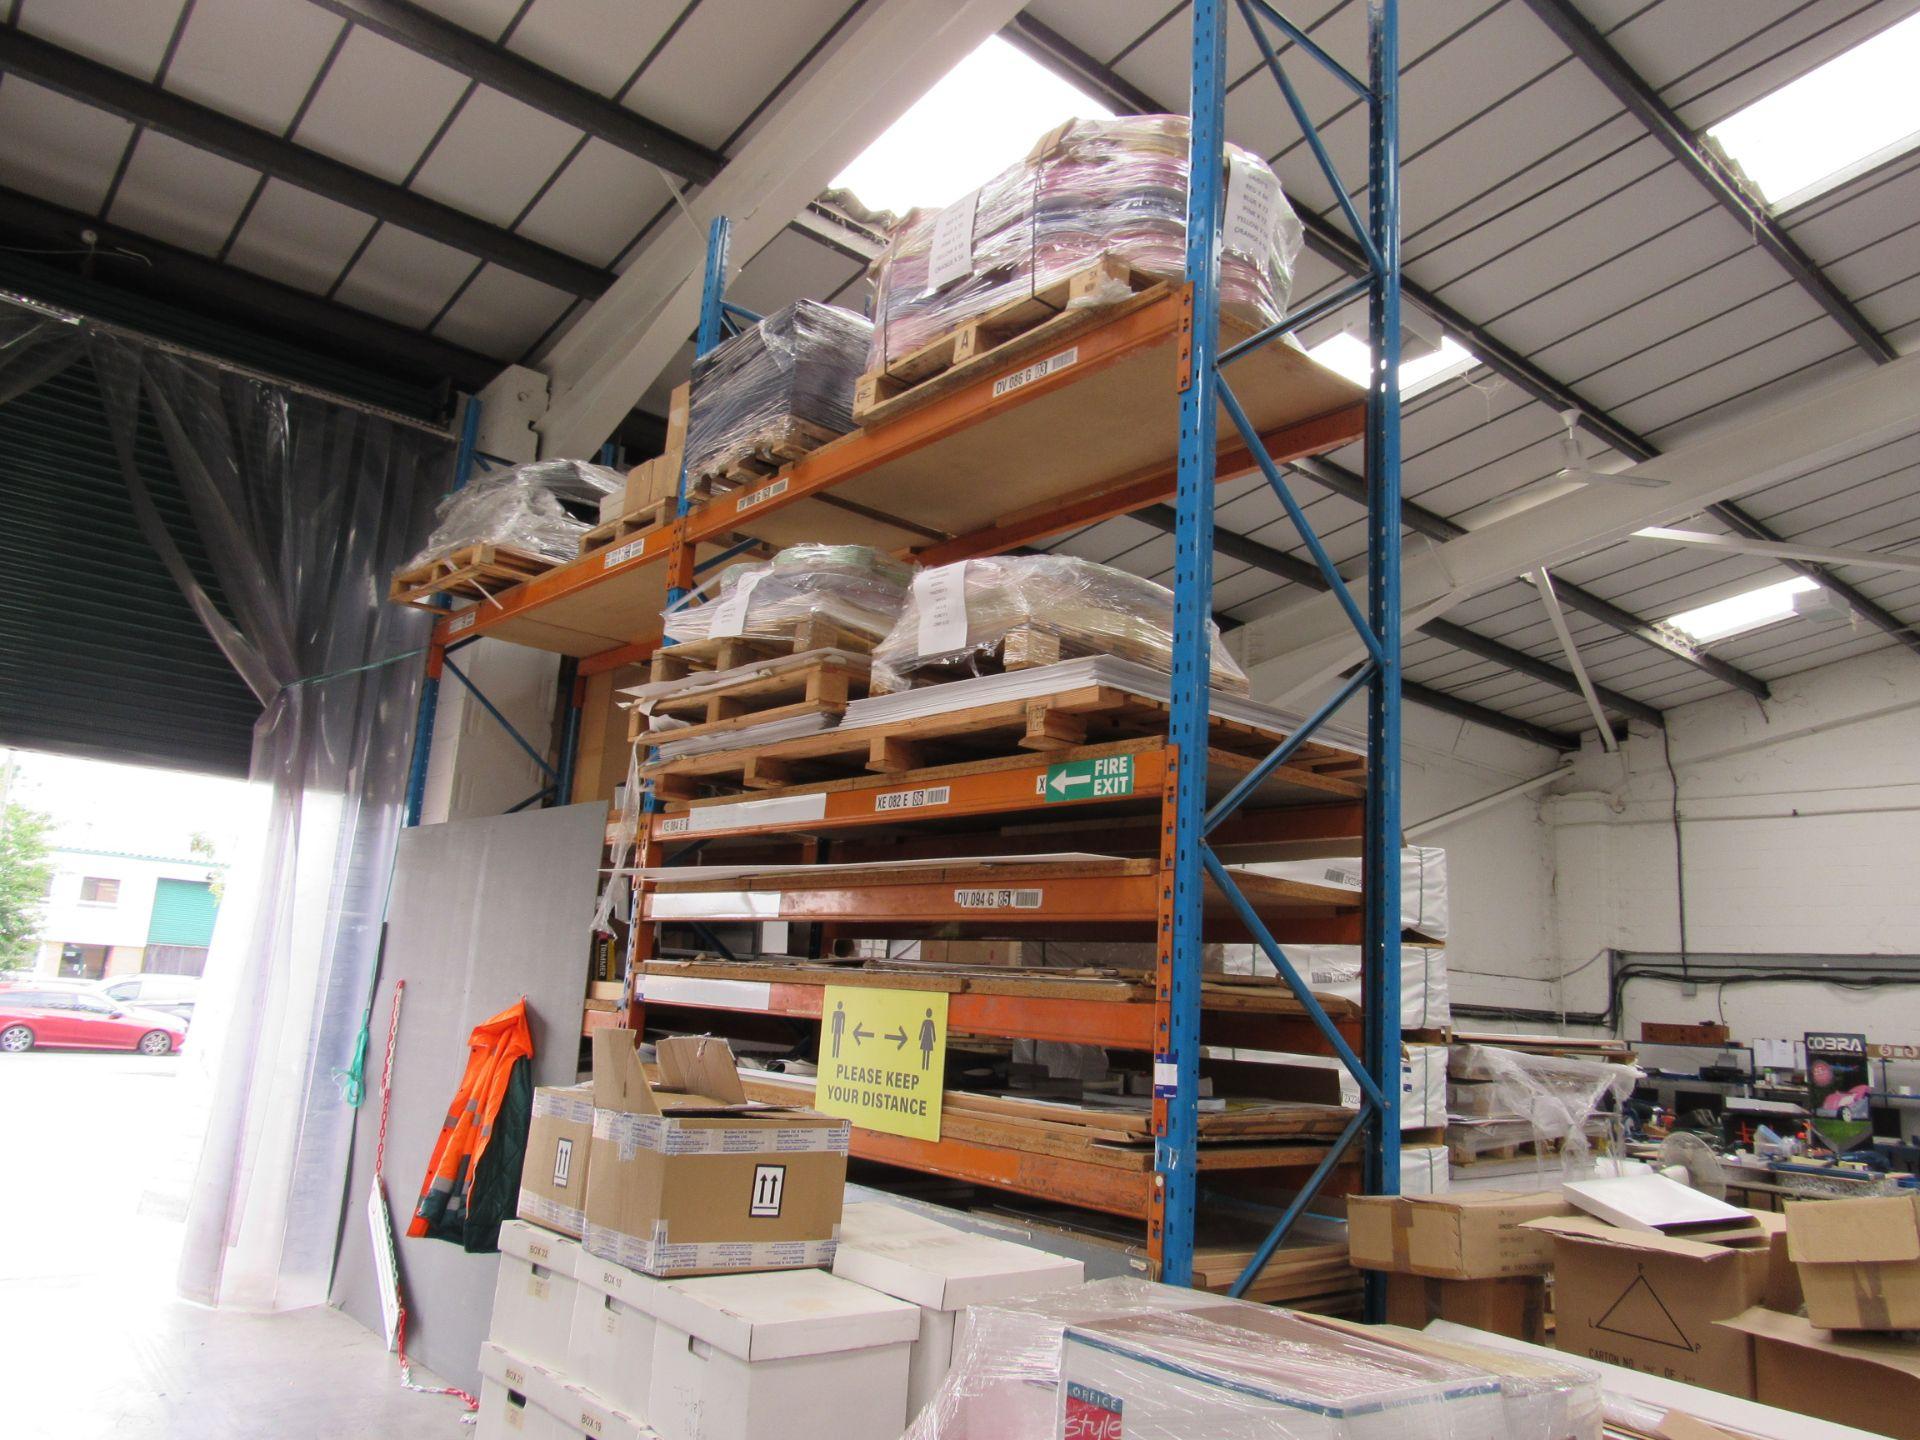 2 Bays Warehouse Racking, 3 End Frames, 22 Cross Beams